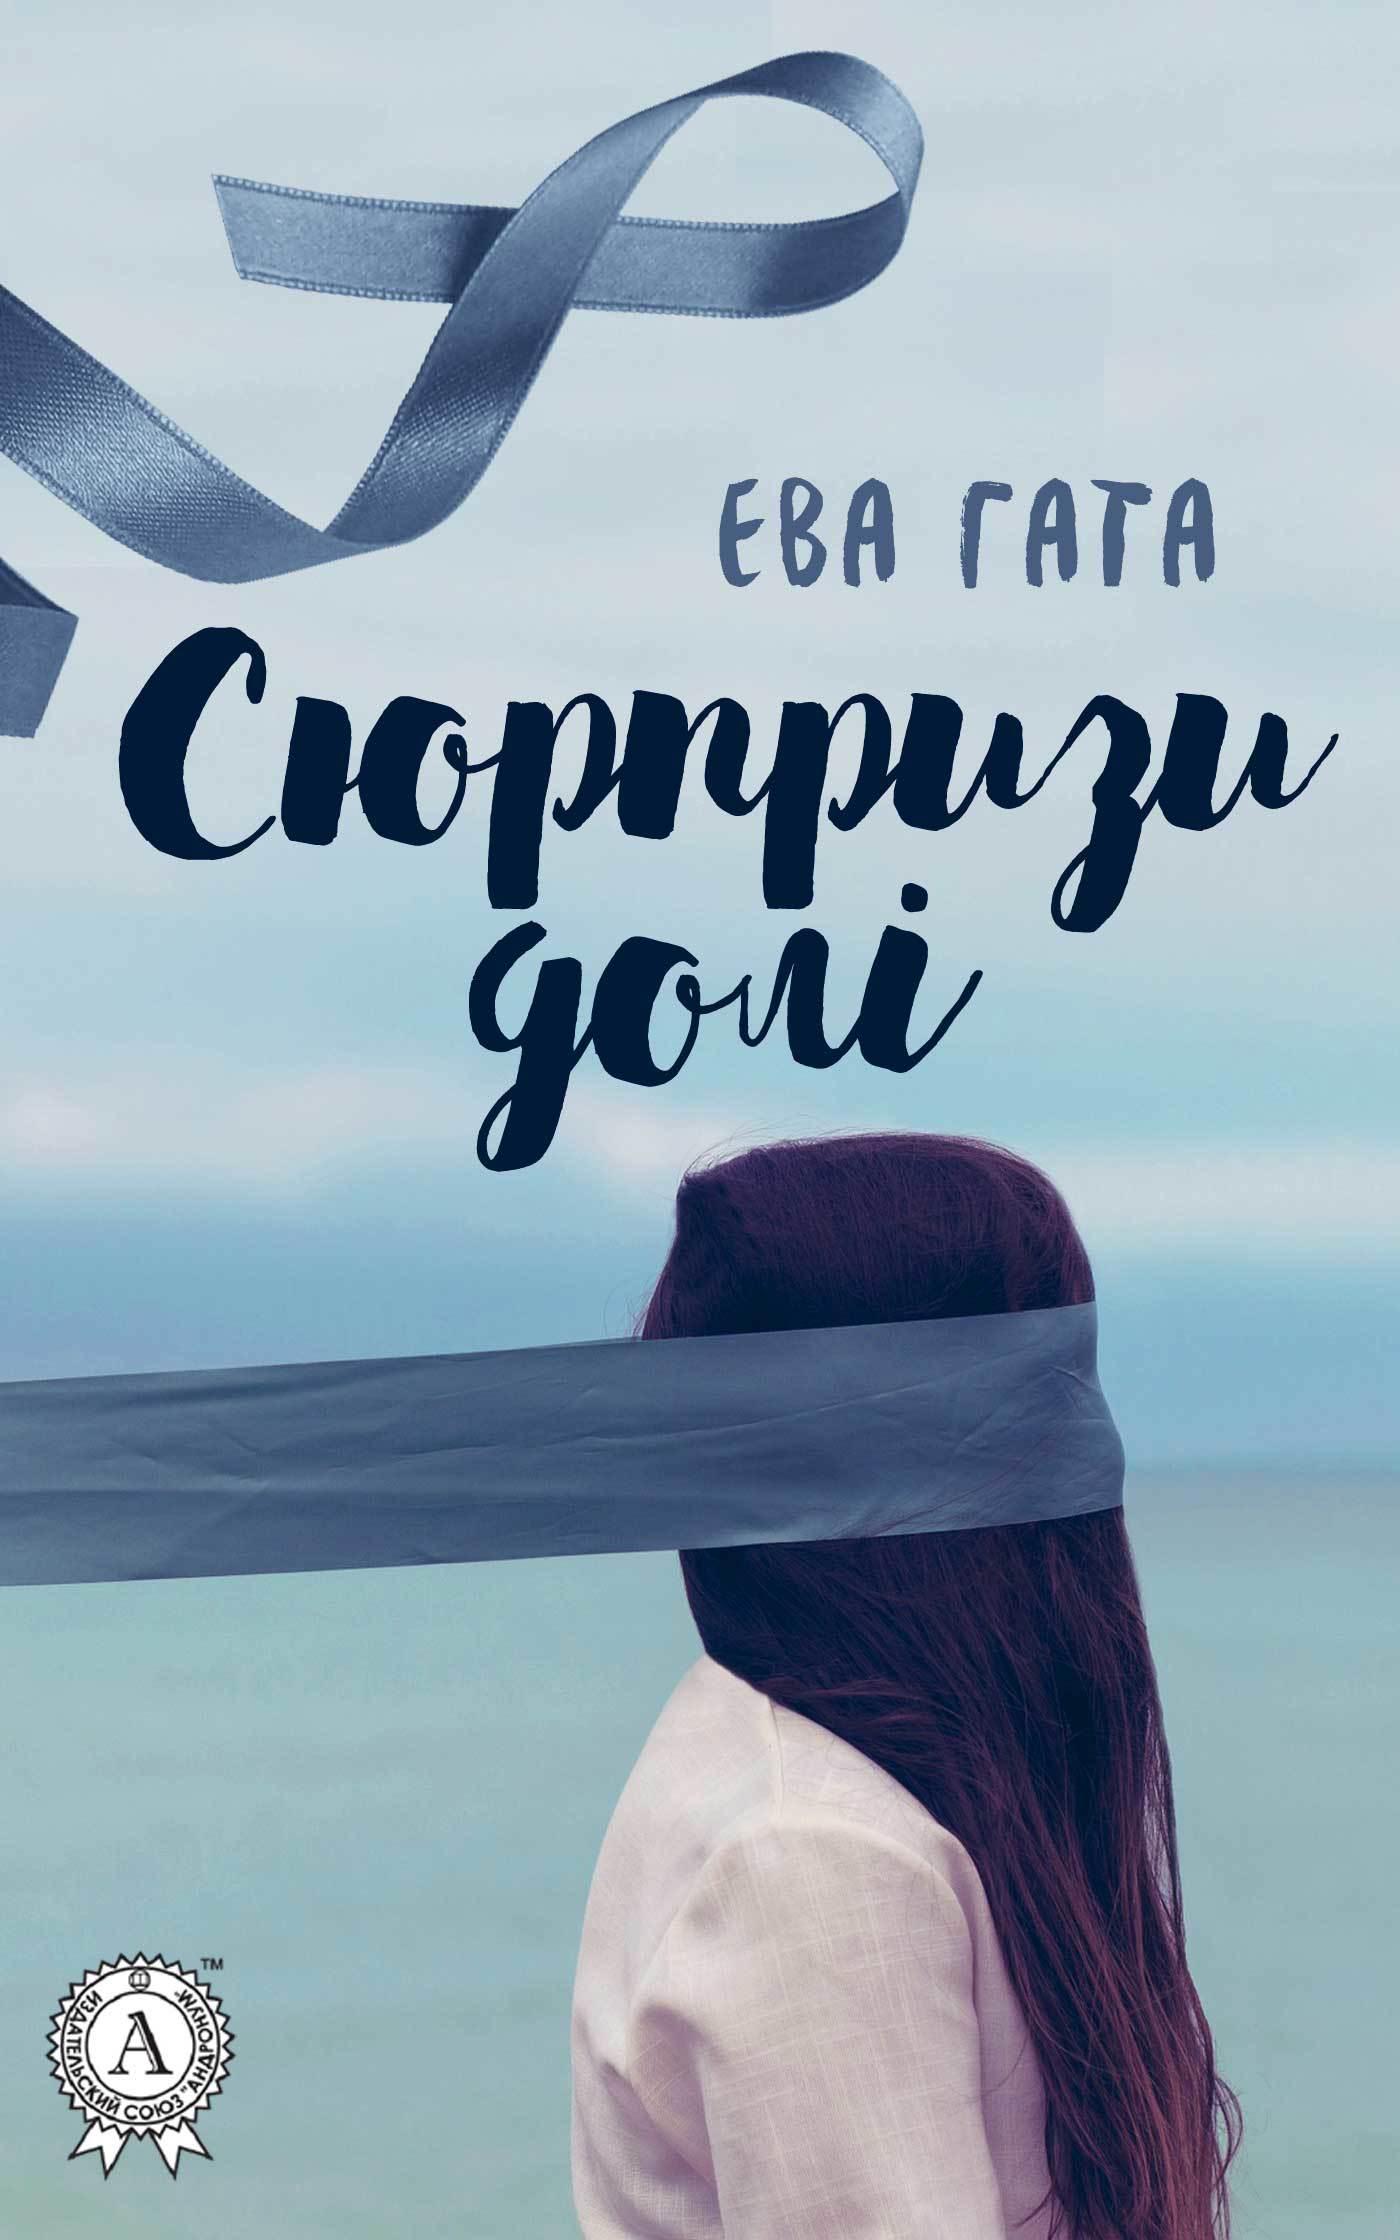 Ева Гата Сюрпризи долі